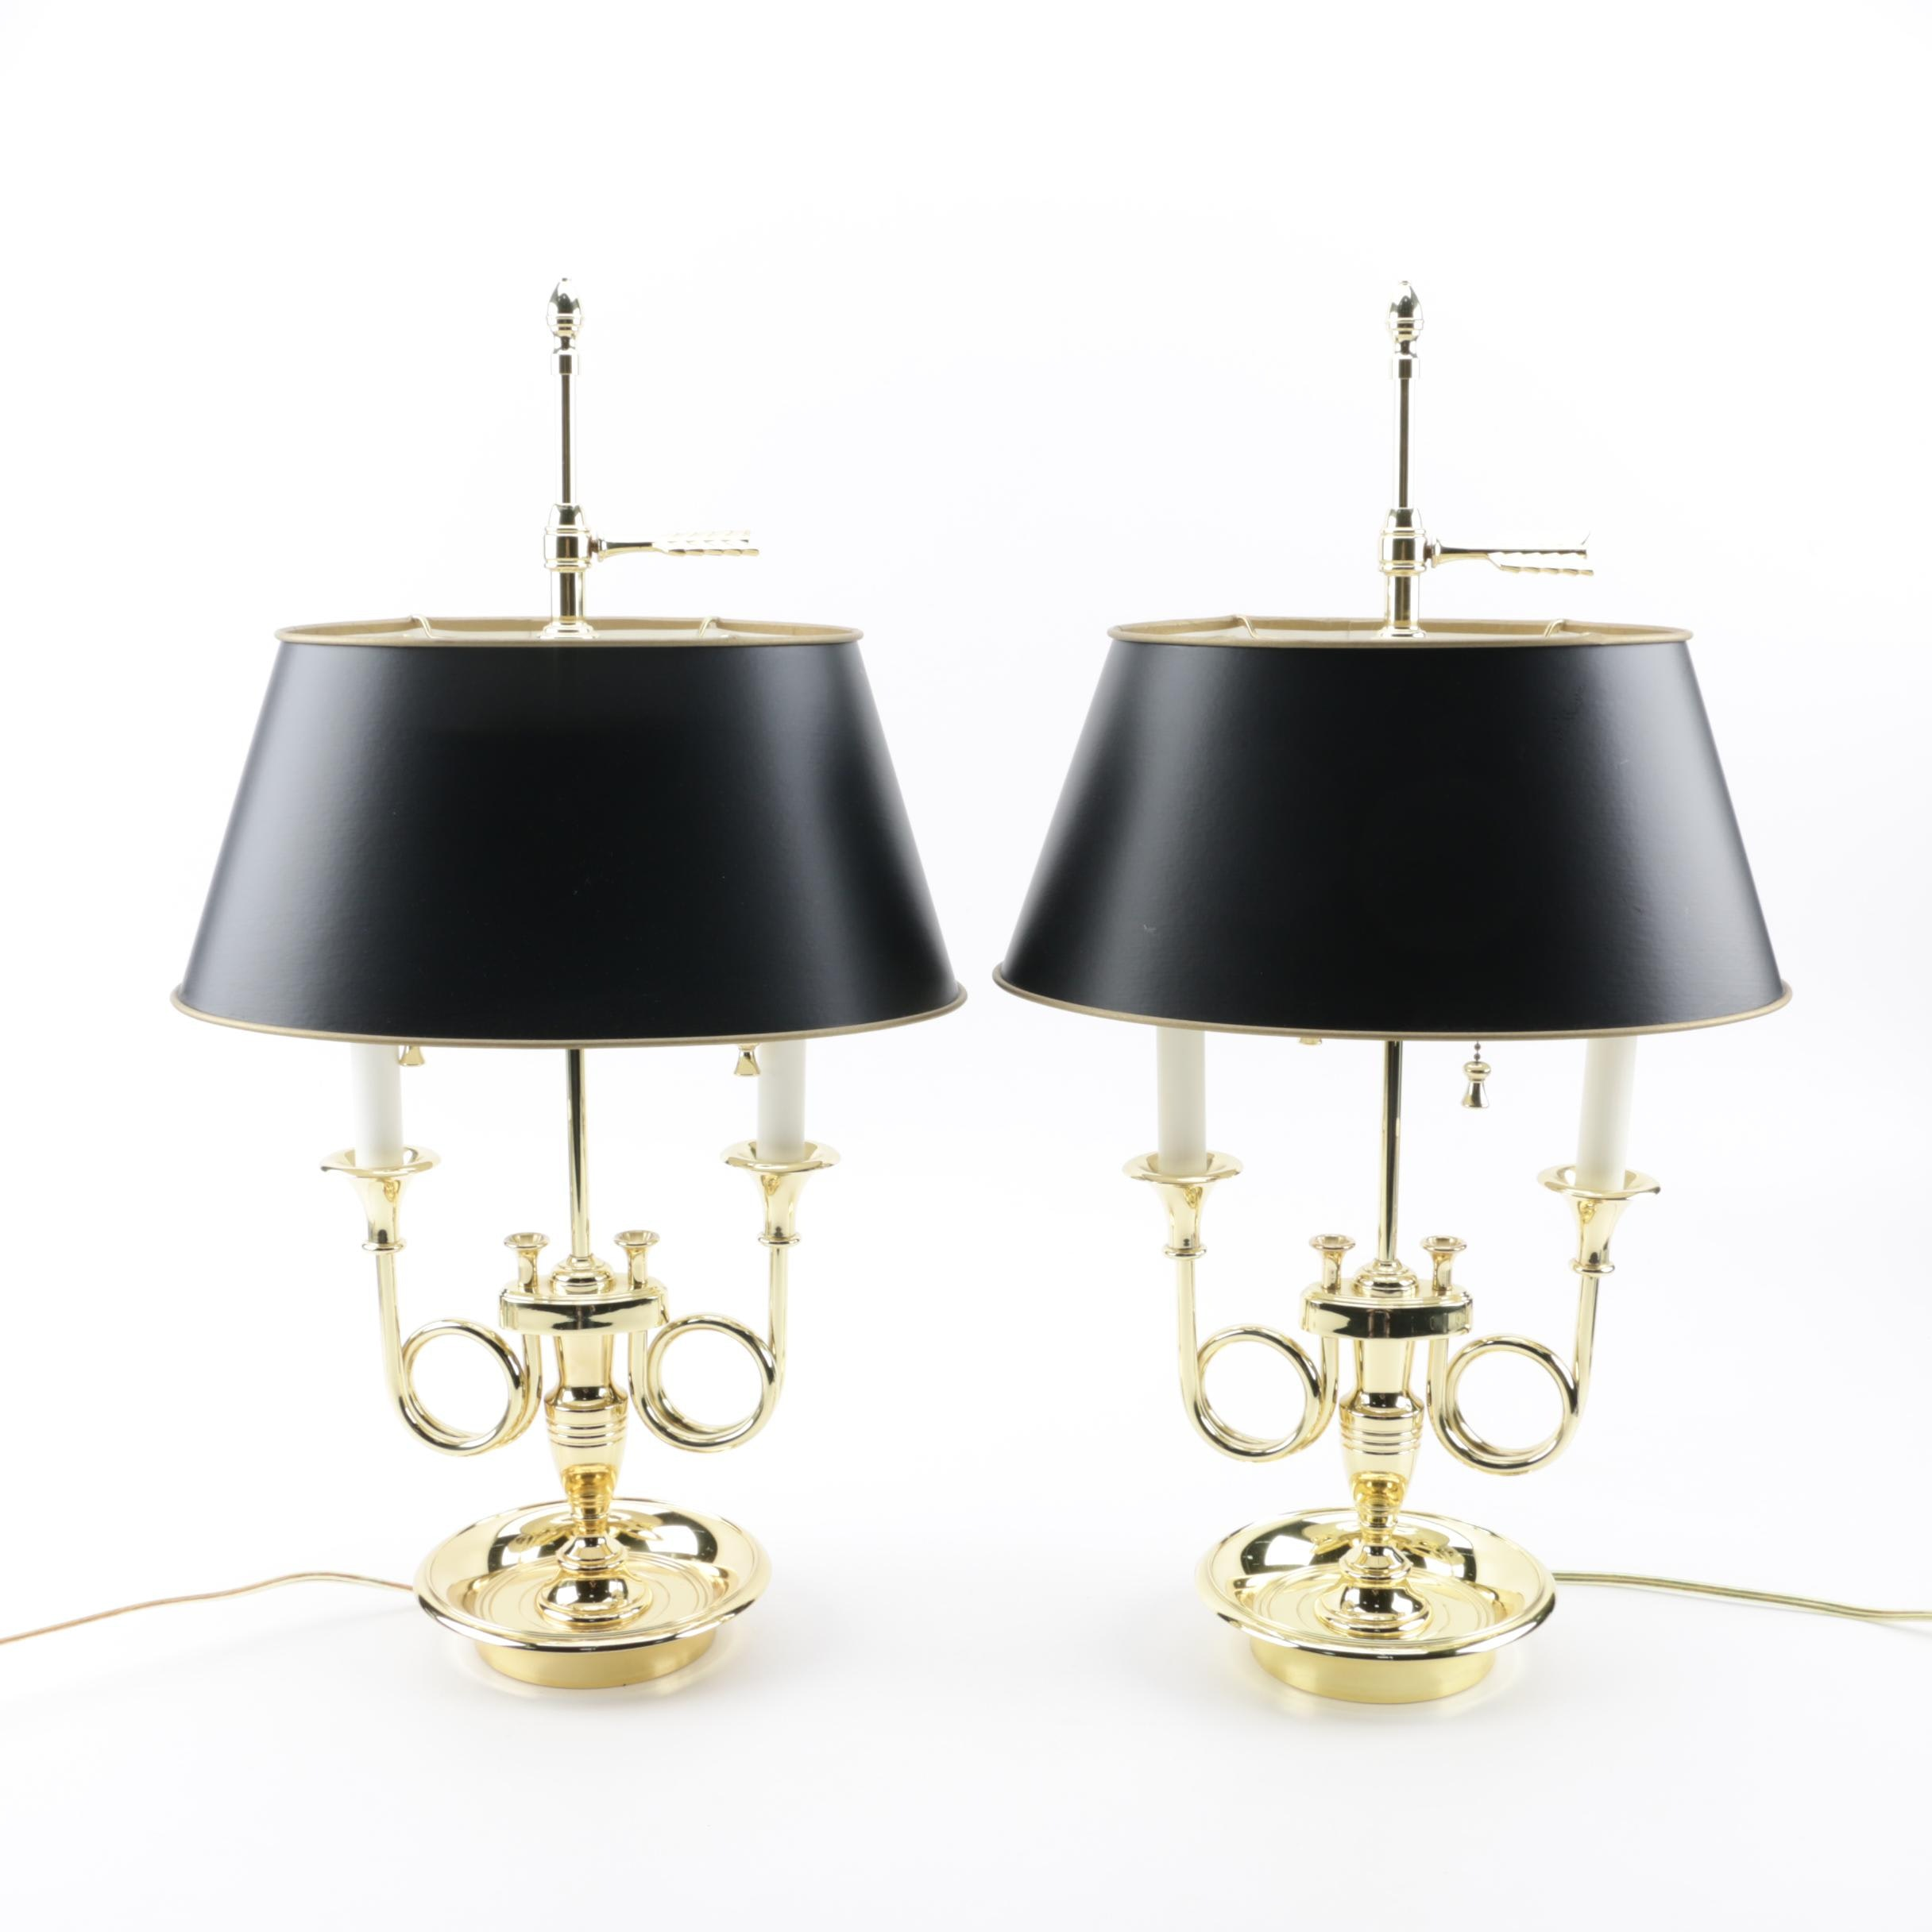 Baldwin Bouillotte Style Double Light Brass Table Lamps